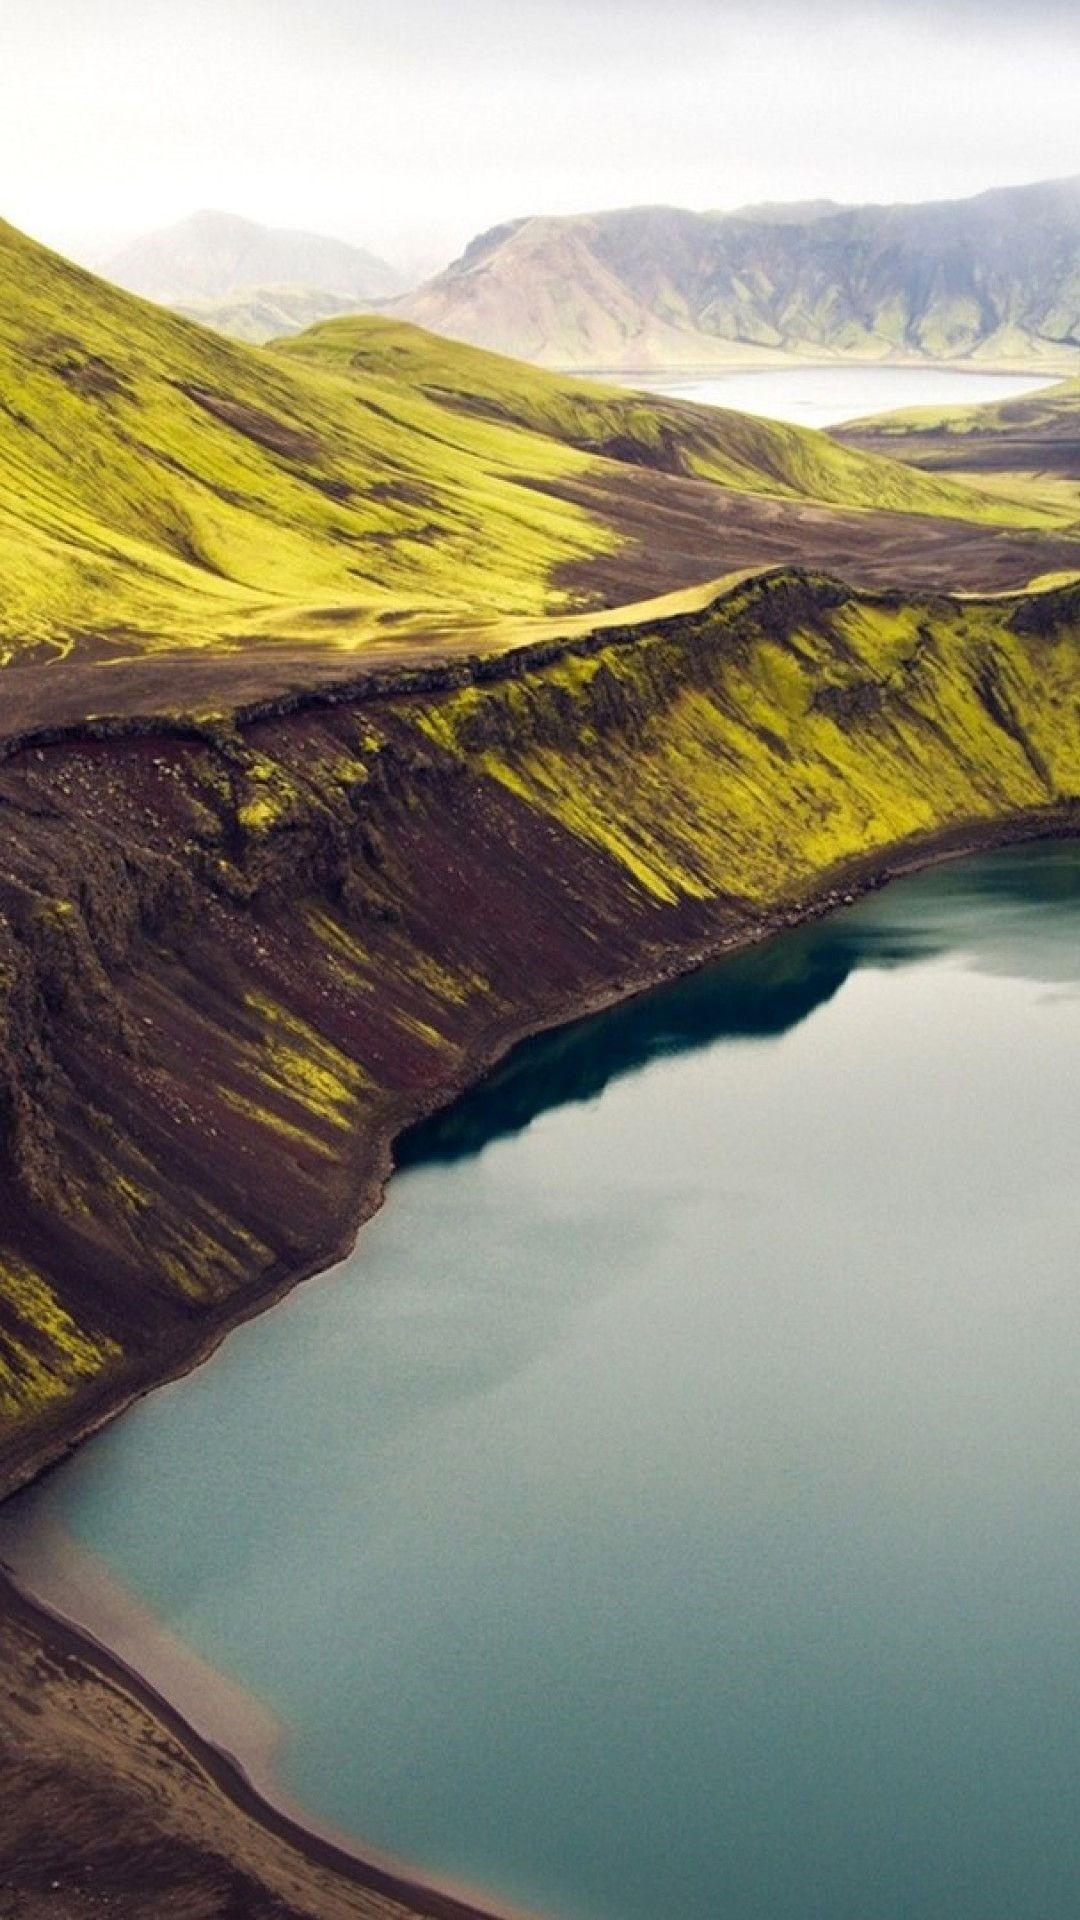 Iceland screensaver wallpaper